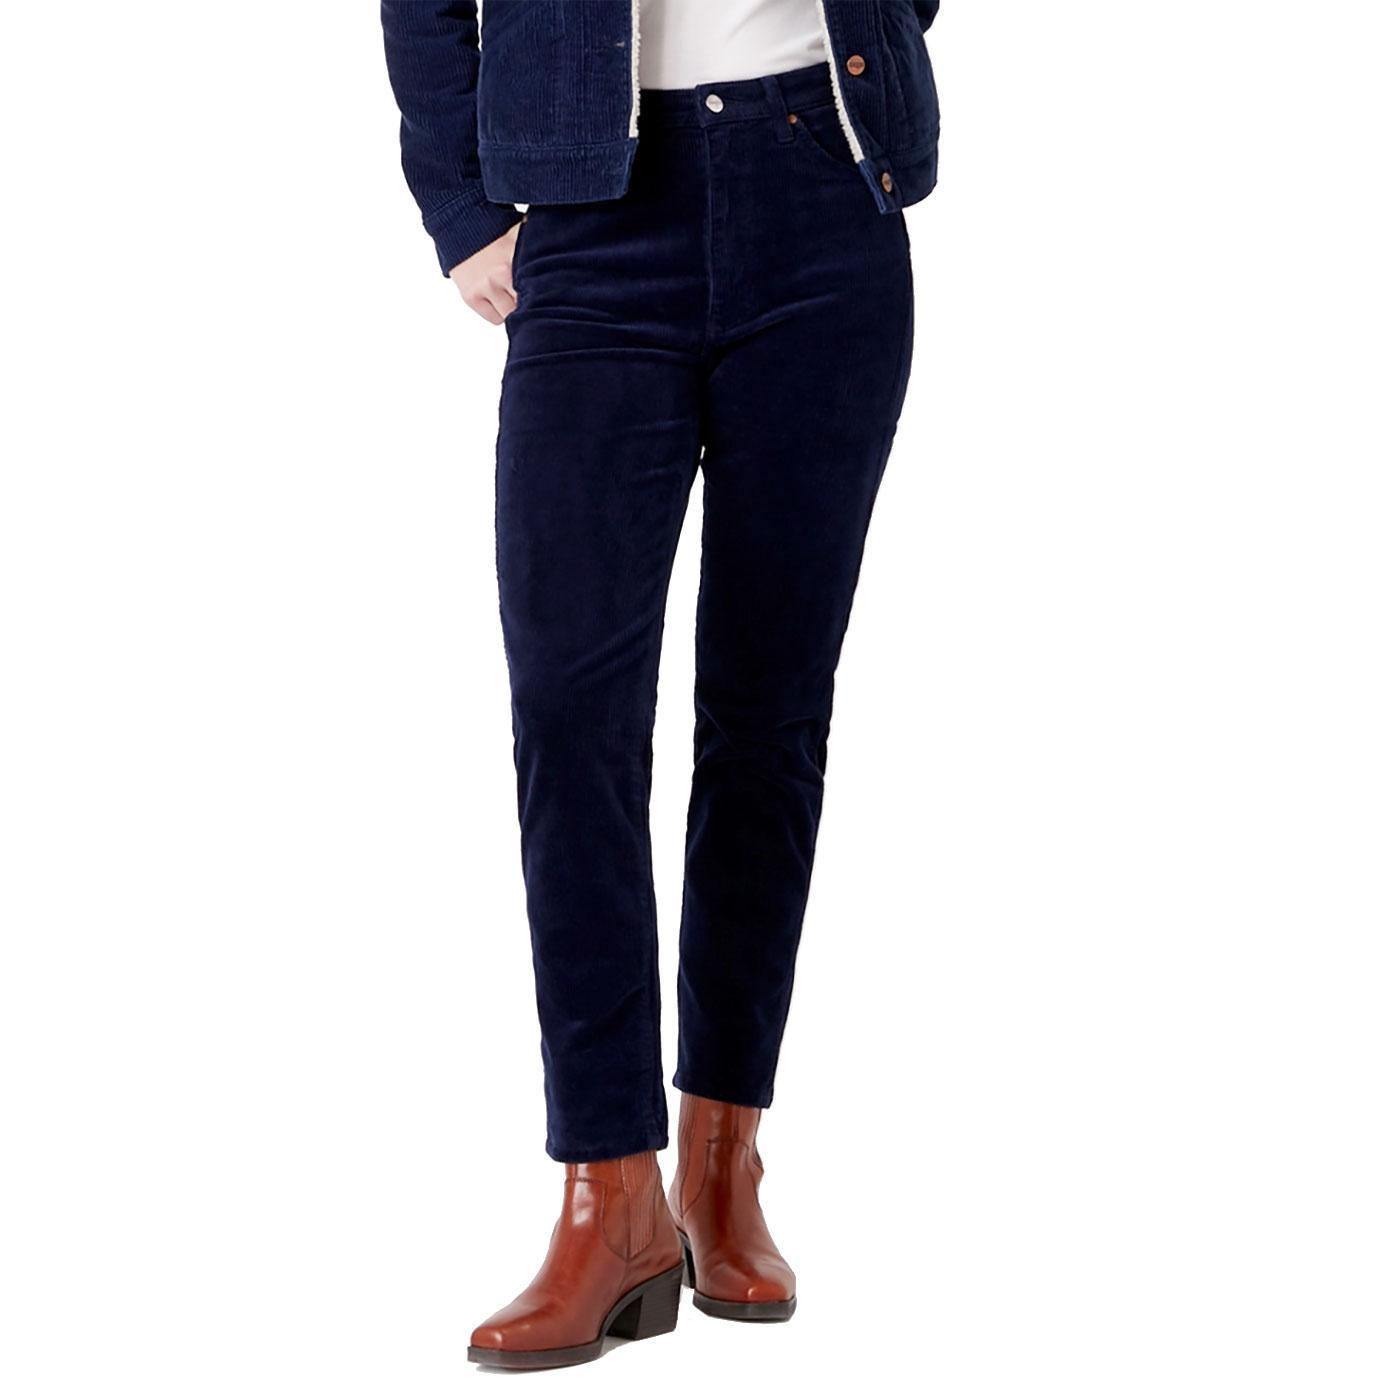 WRANGLER Women's 11WWZ Slim High Waist Cord Jeans